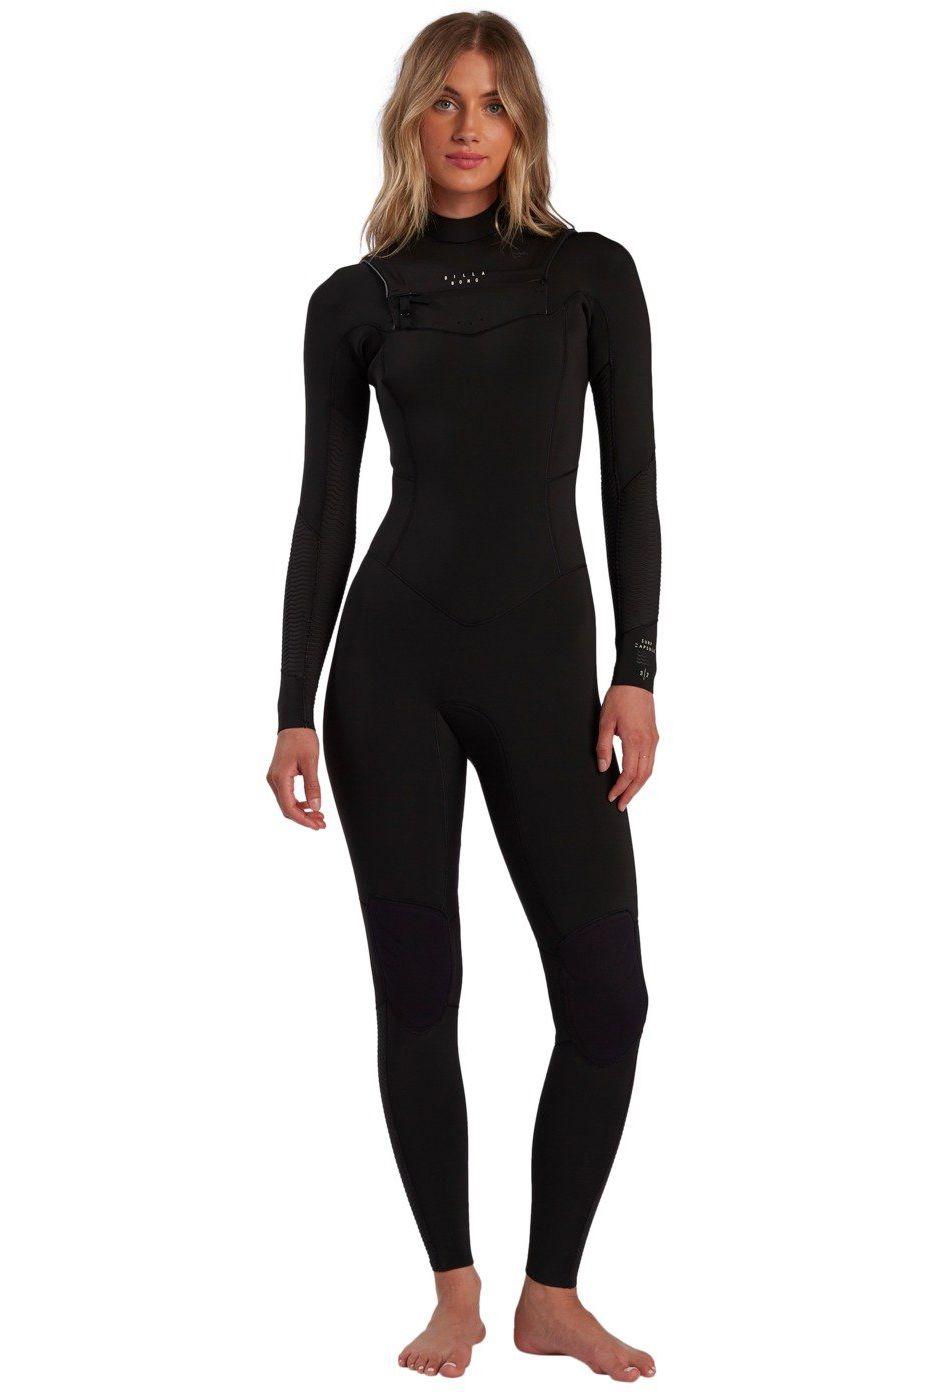 Billabong Wetsuit 302 SALTY DAYZ FULL SURF CAPSULE Black 3x2mm